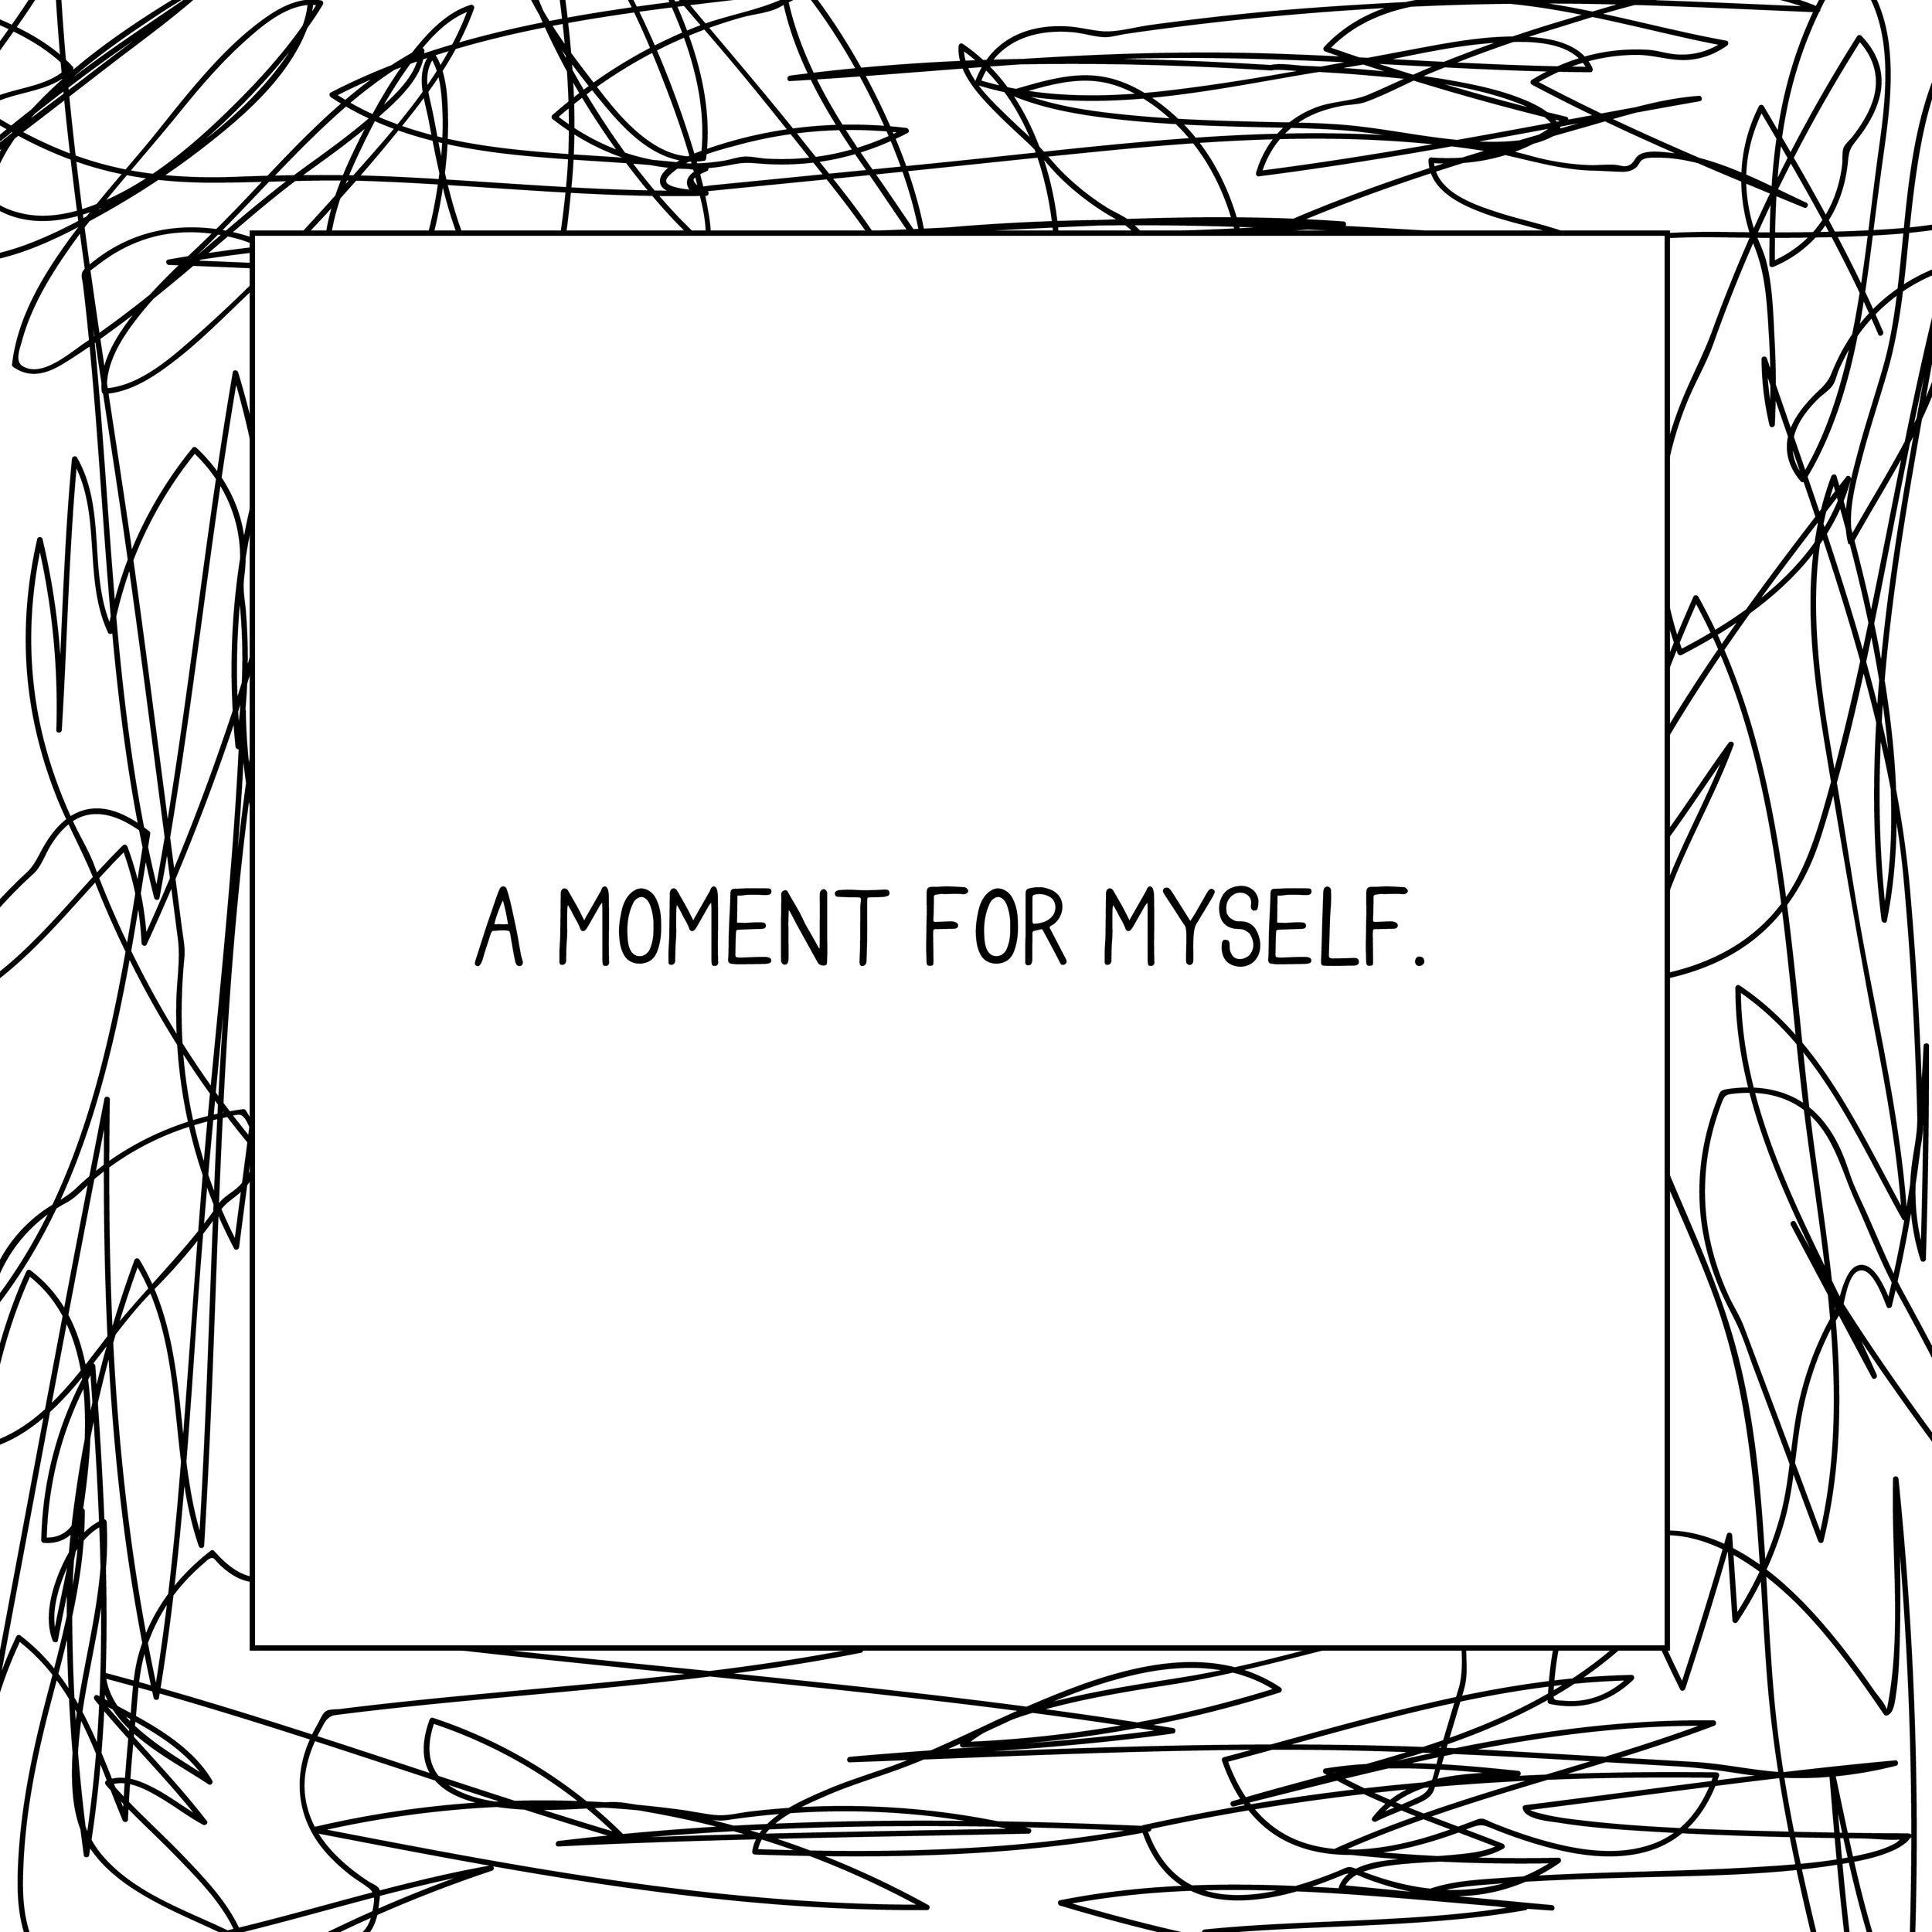 amomentformyself-01.jpg